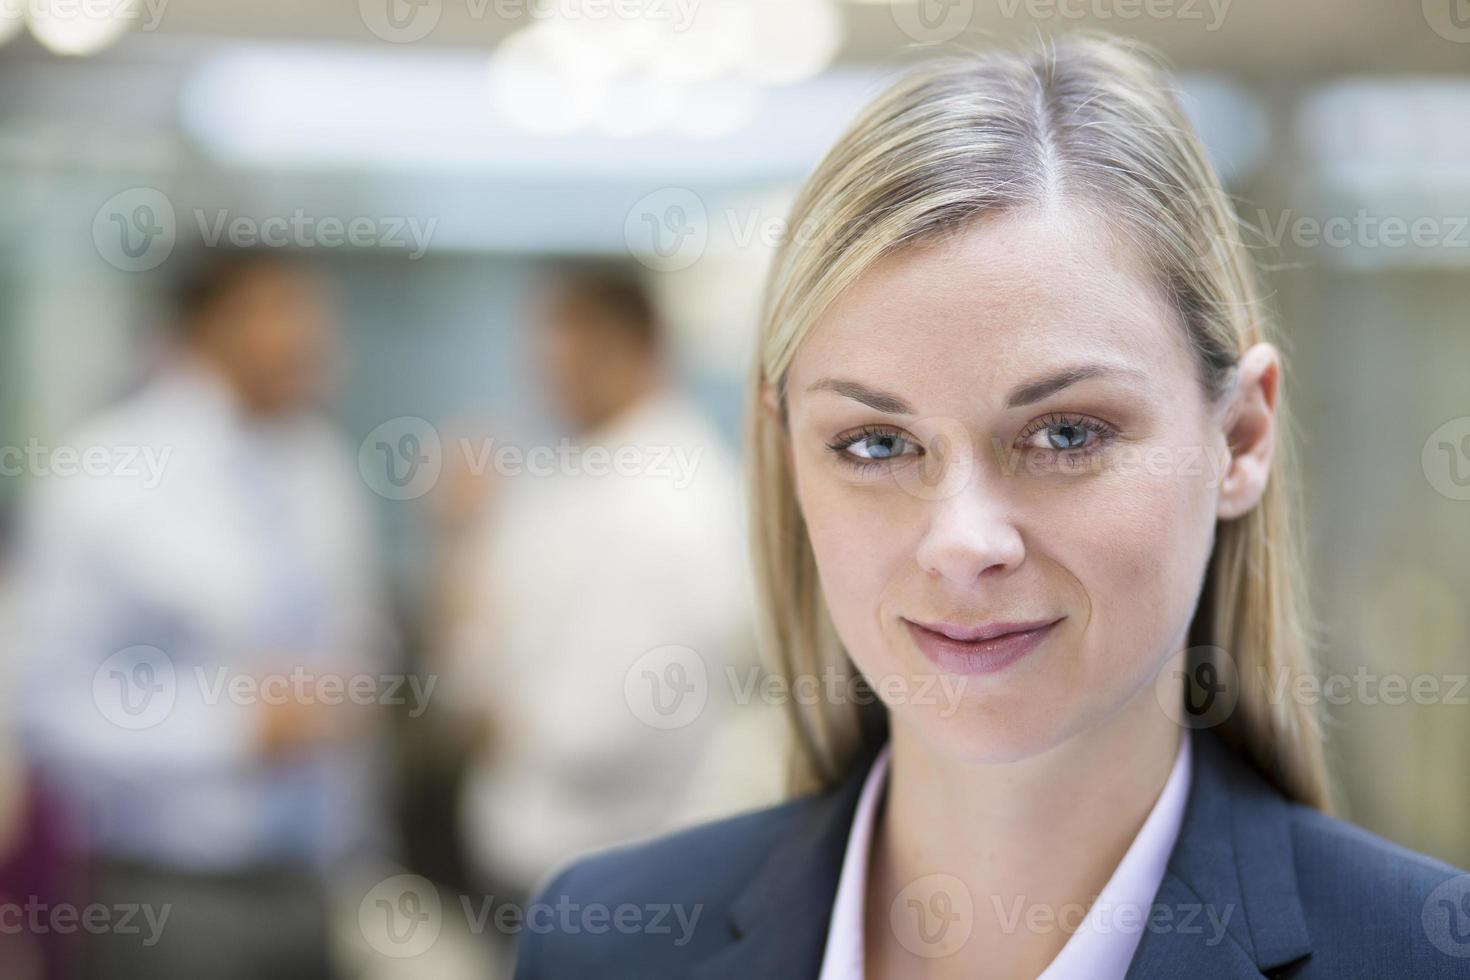 bella imprenditrice in posa mentre i colleghi parlano insieme in background foto